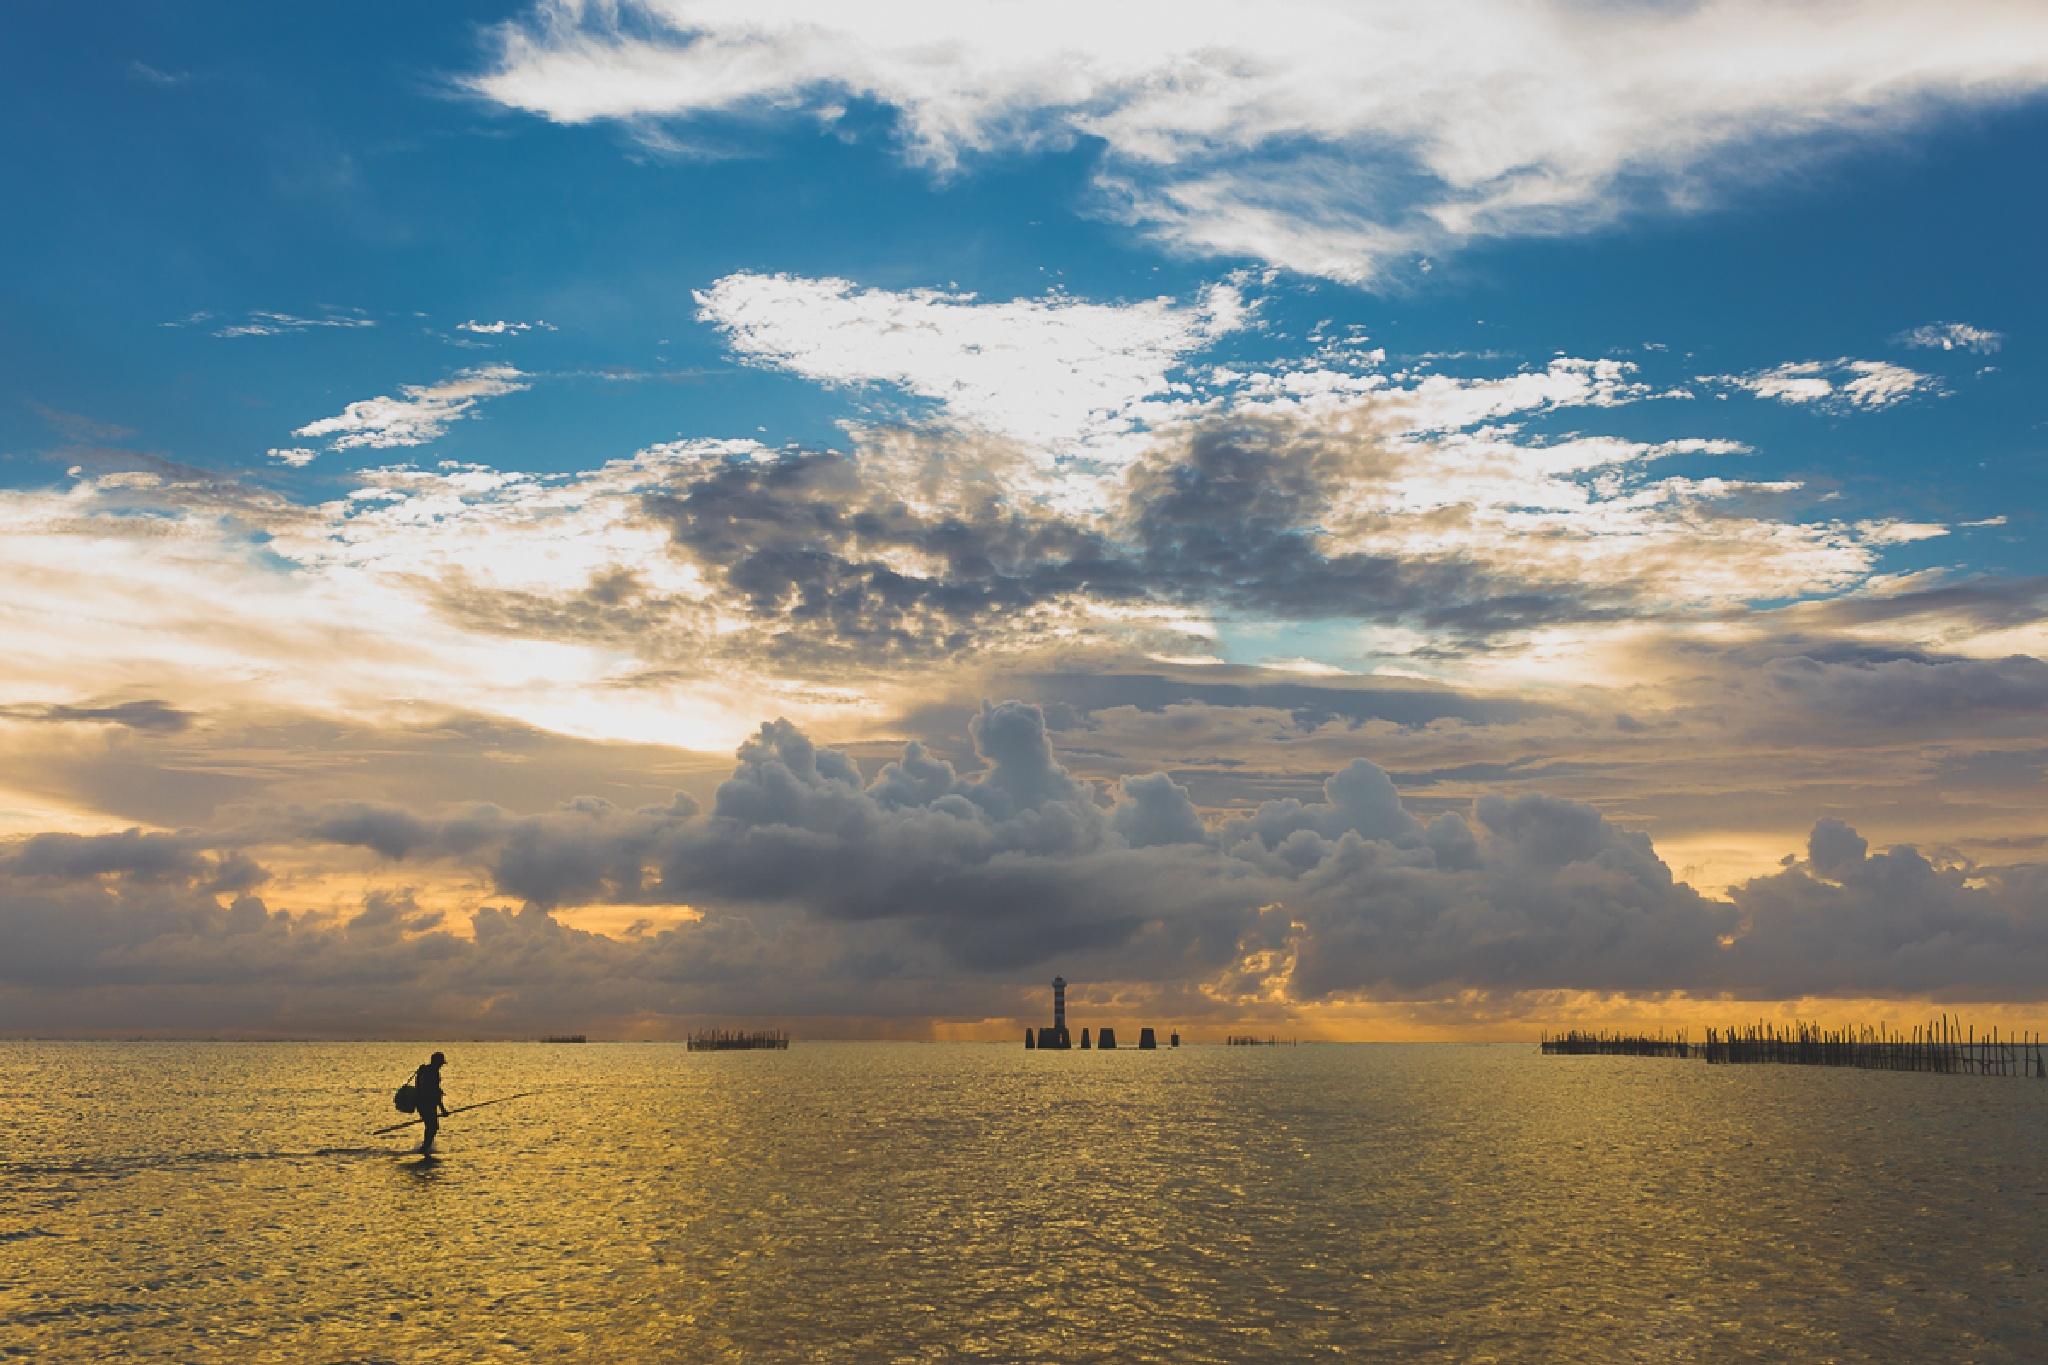 The fisherman by Renner Boldrino